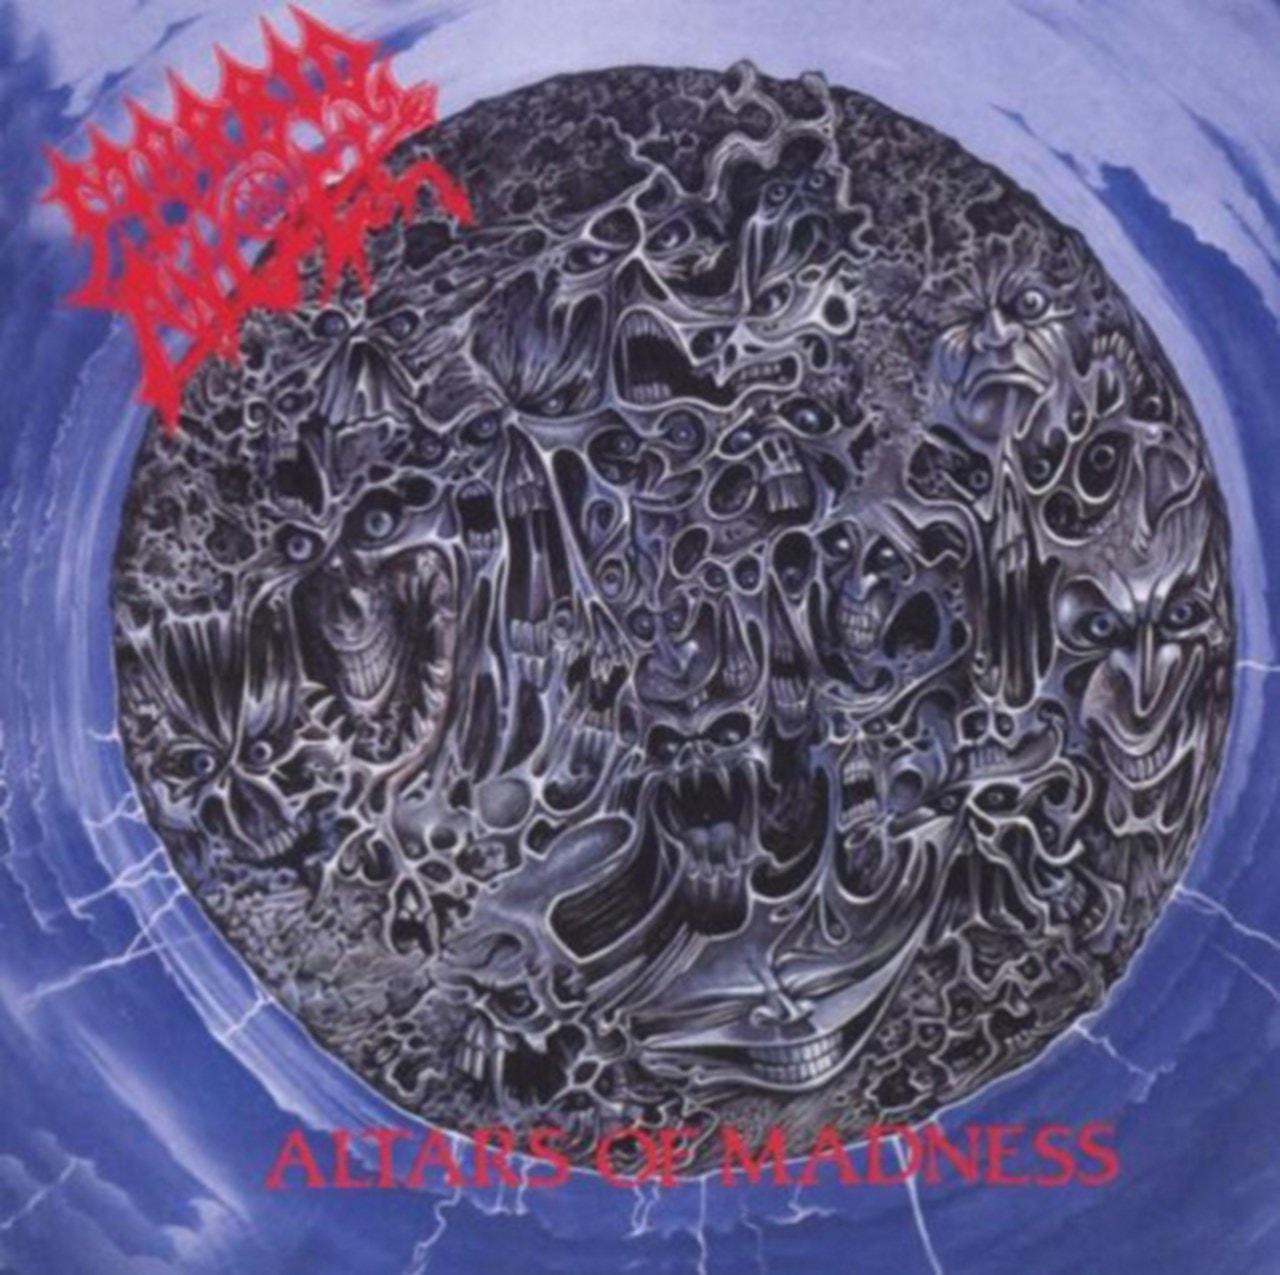 Altars of Madness - 1